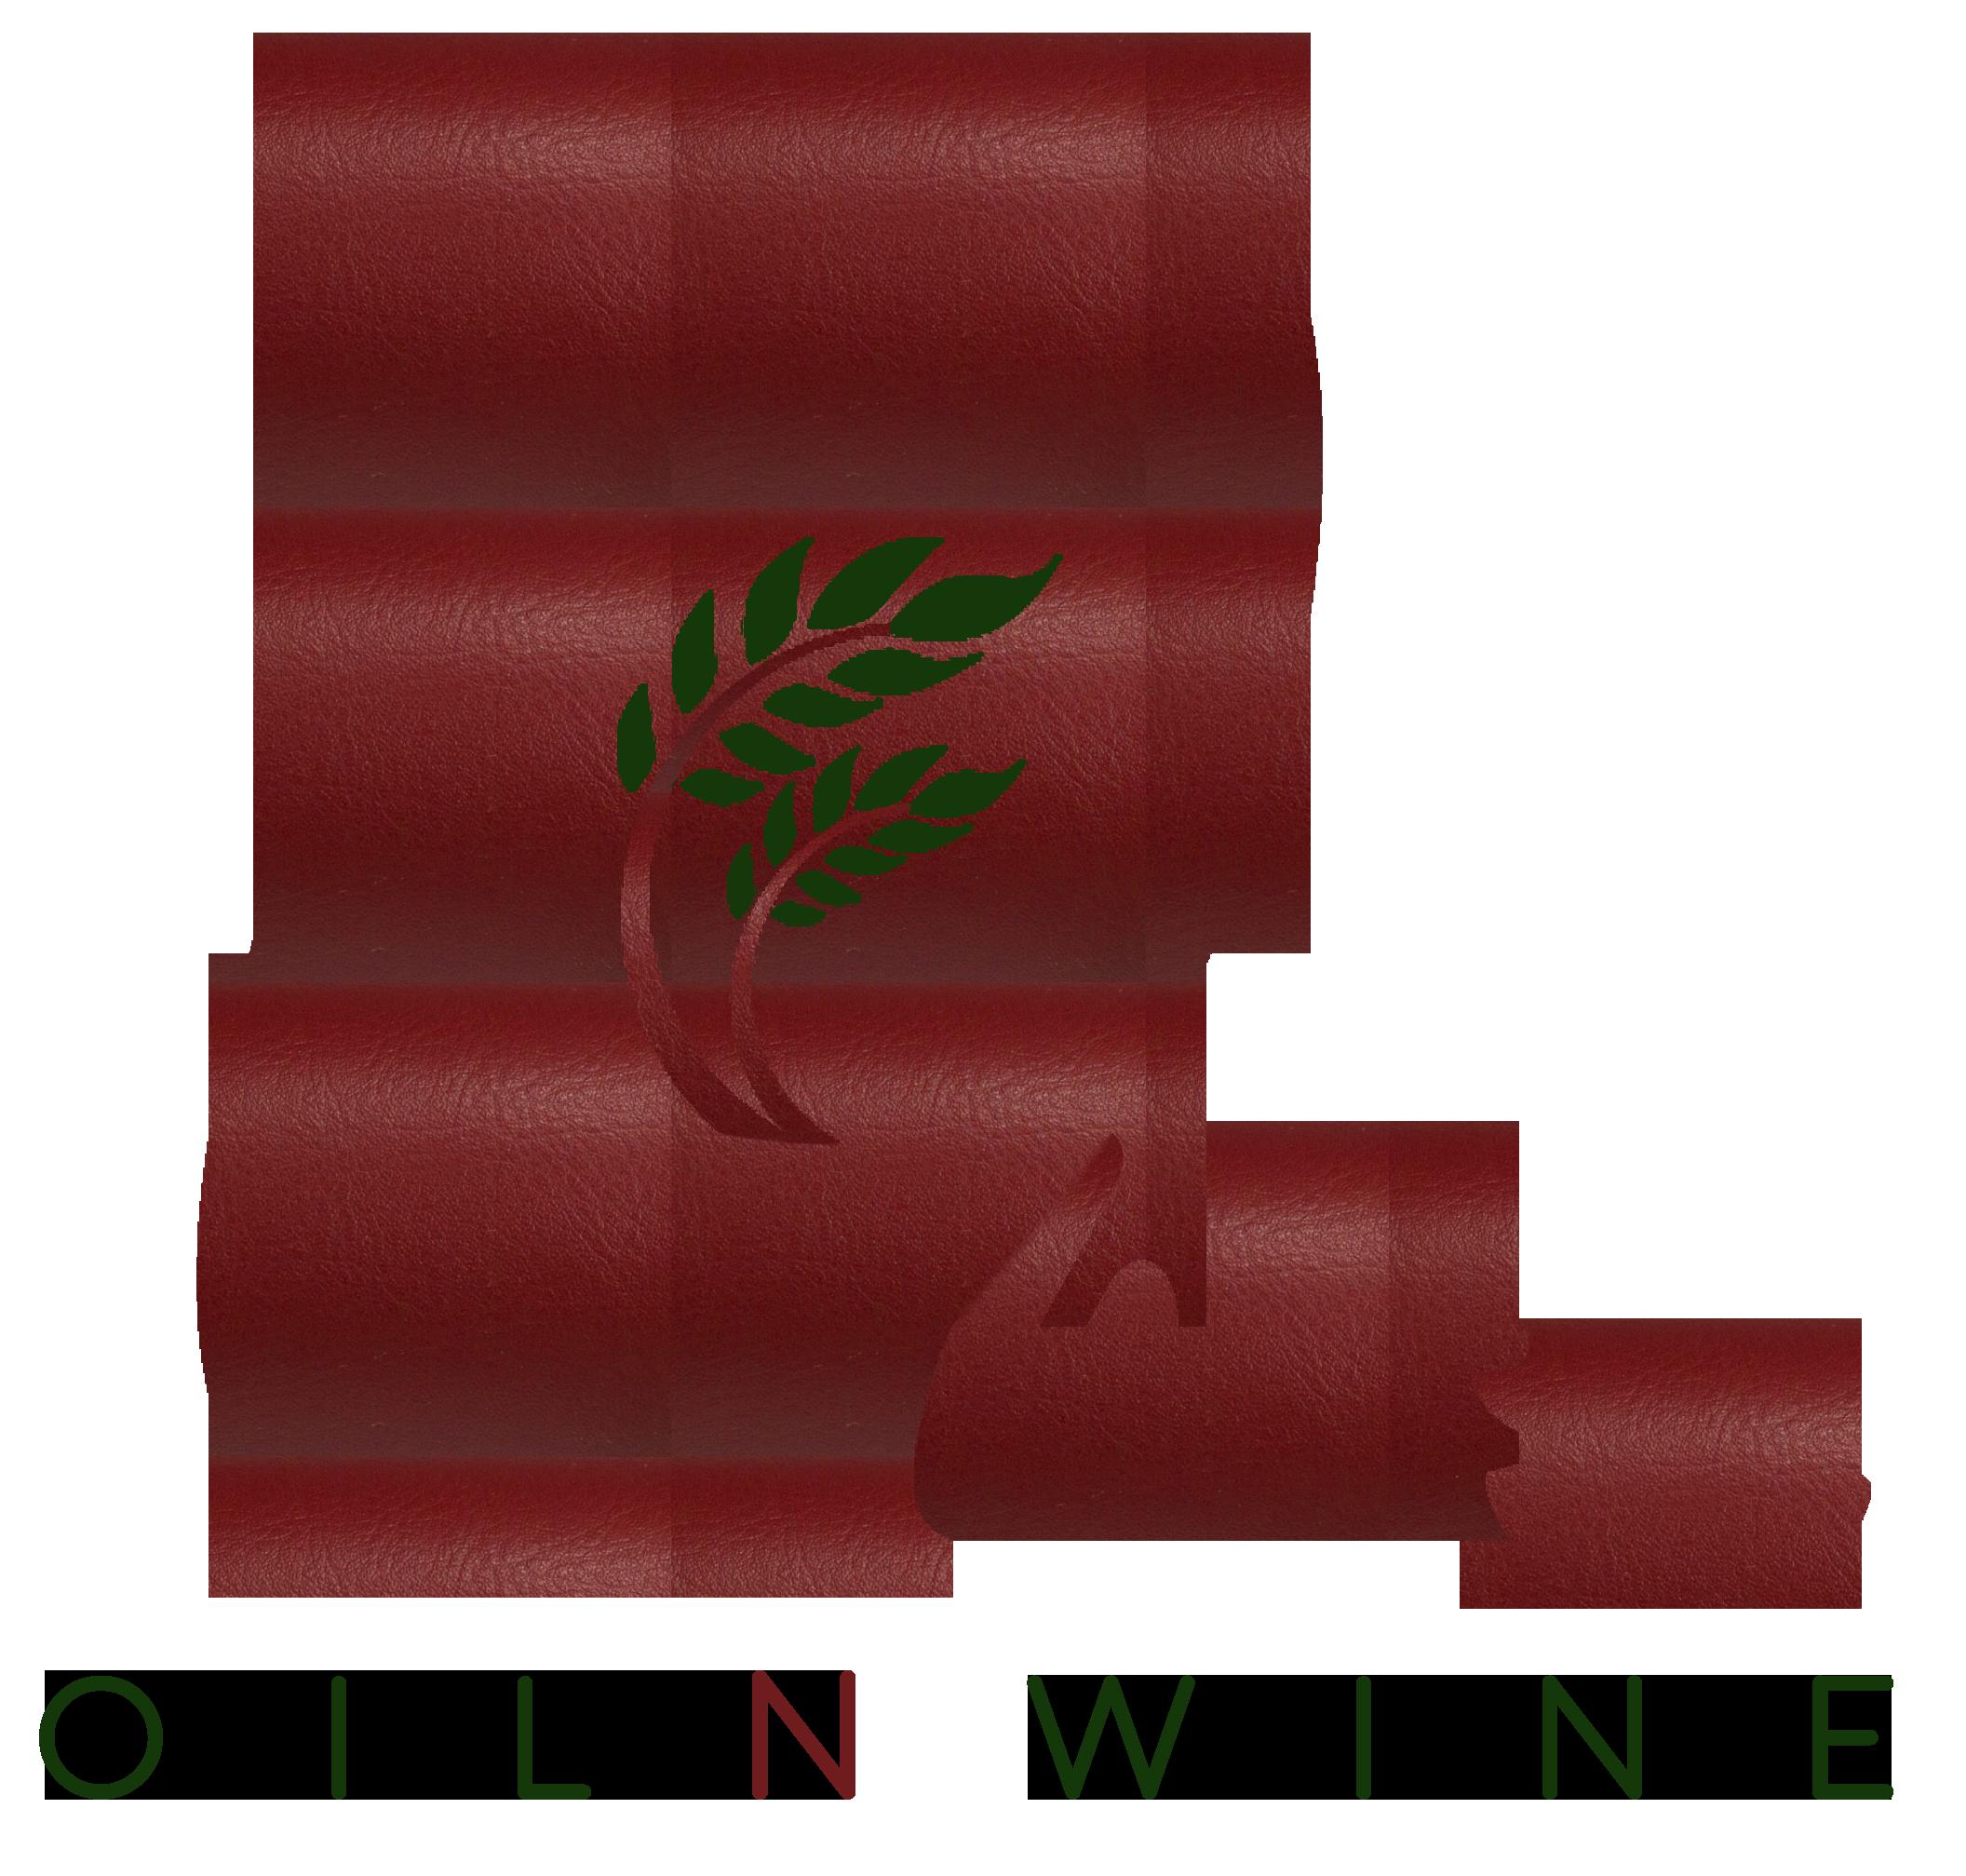 oilnwine dark logo